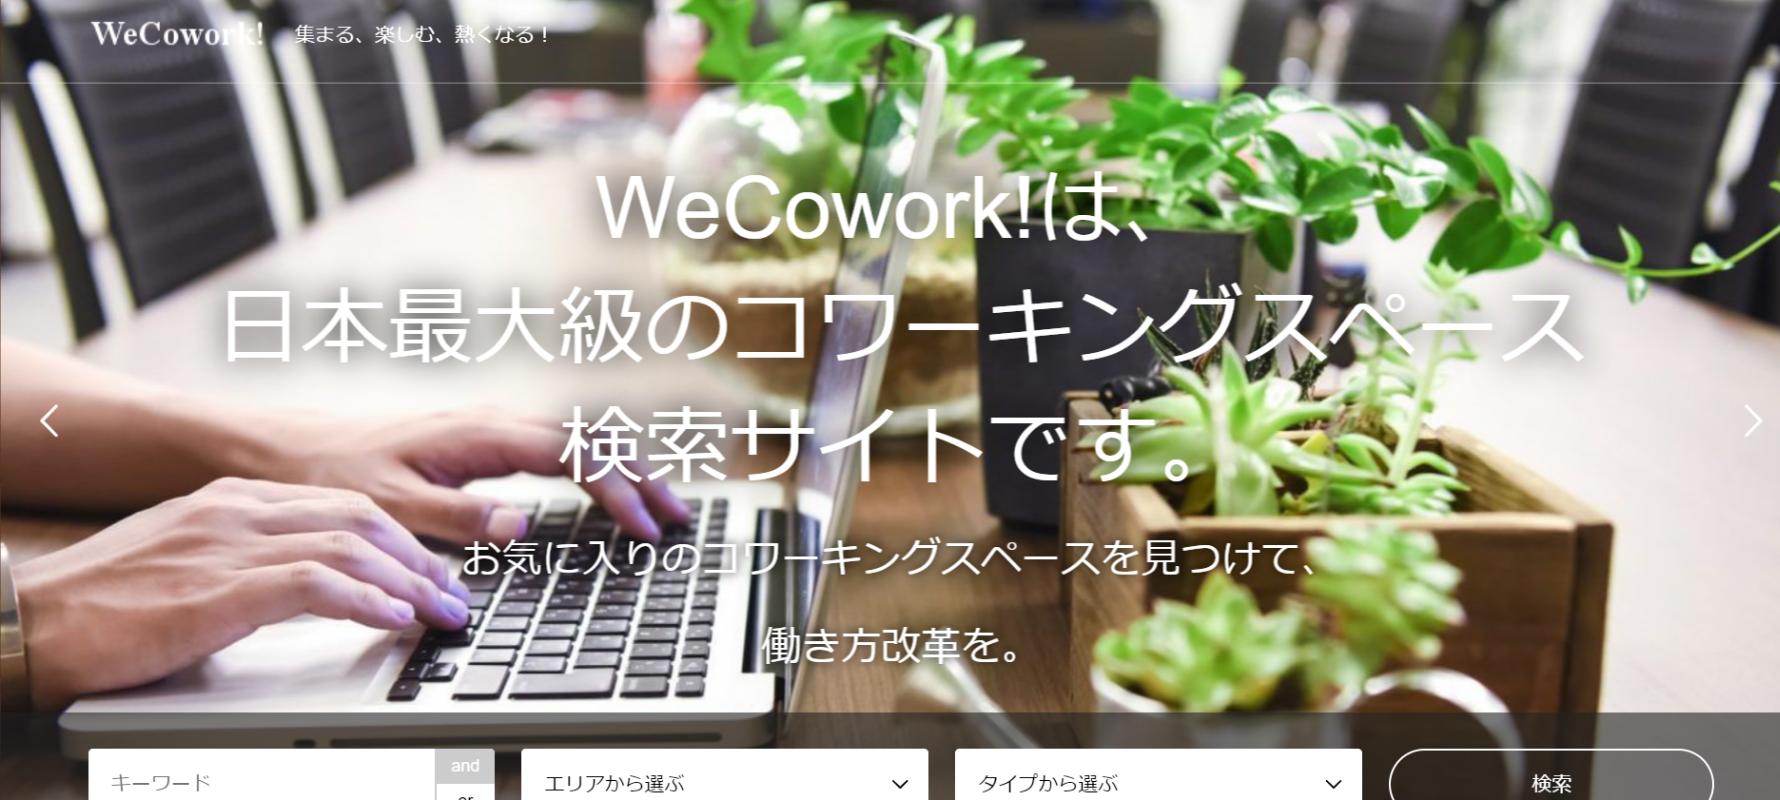 WeCowork!